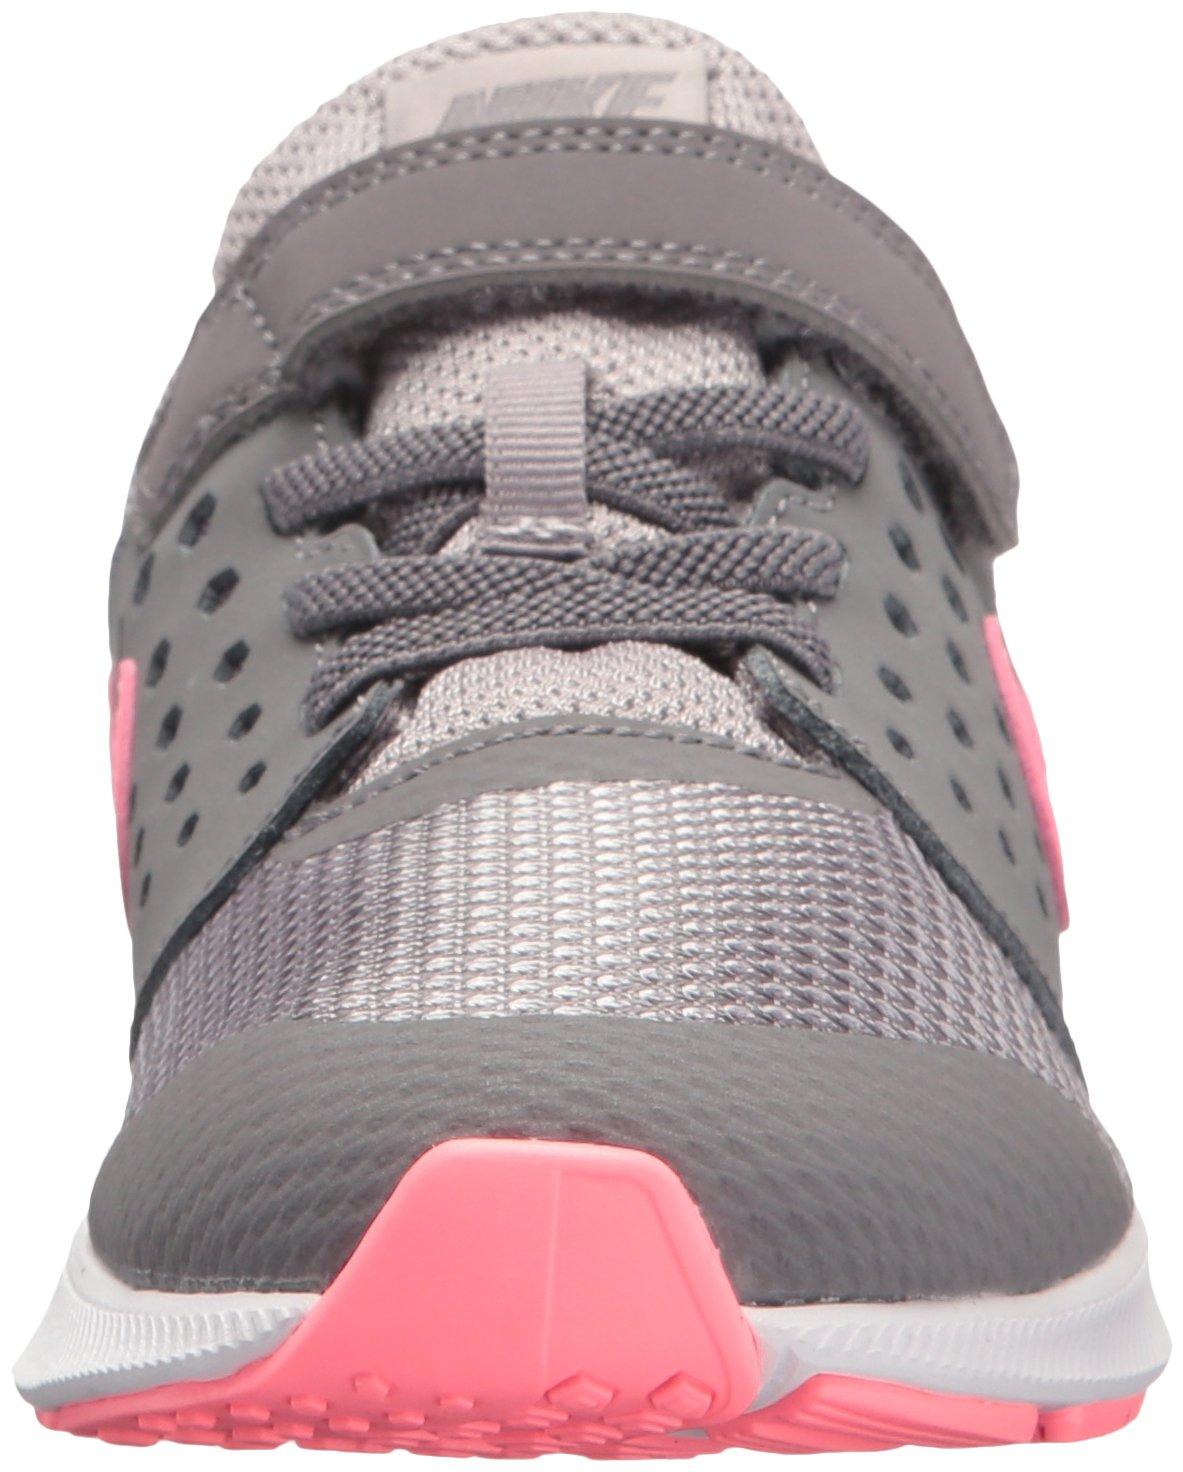 Nike Girls' Downshifter 7 (PSV) Running Shoe, Gunsmoke/Sunset Pulse-Atmosphere Grey, 2 M US Little Kid by Nike (Image #4)